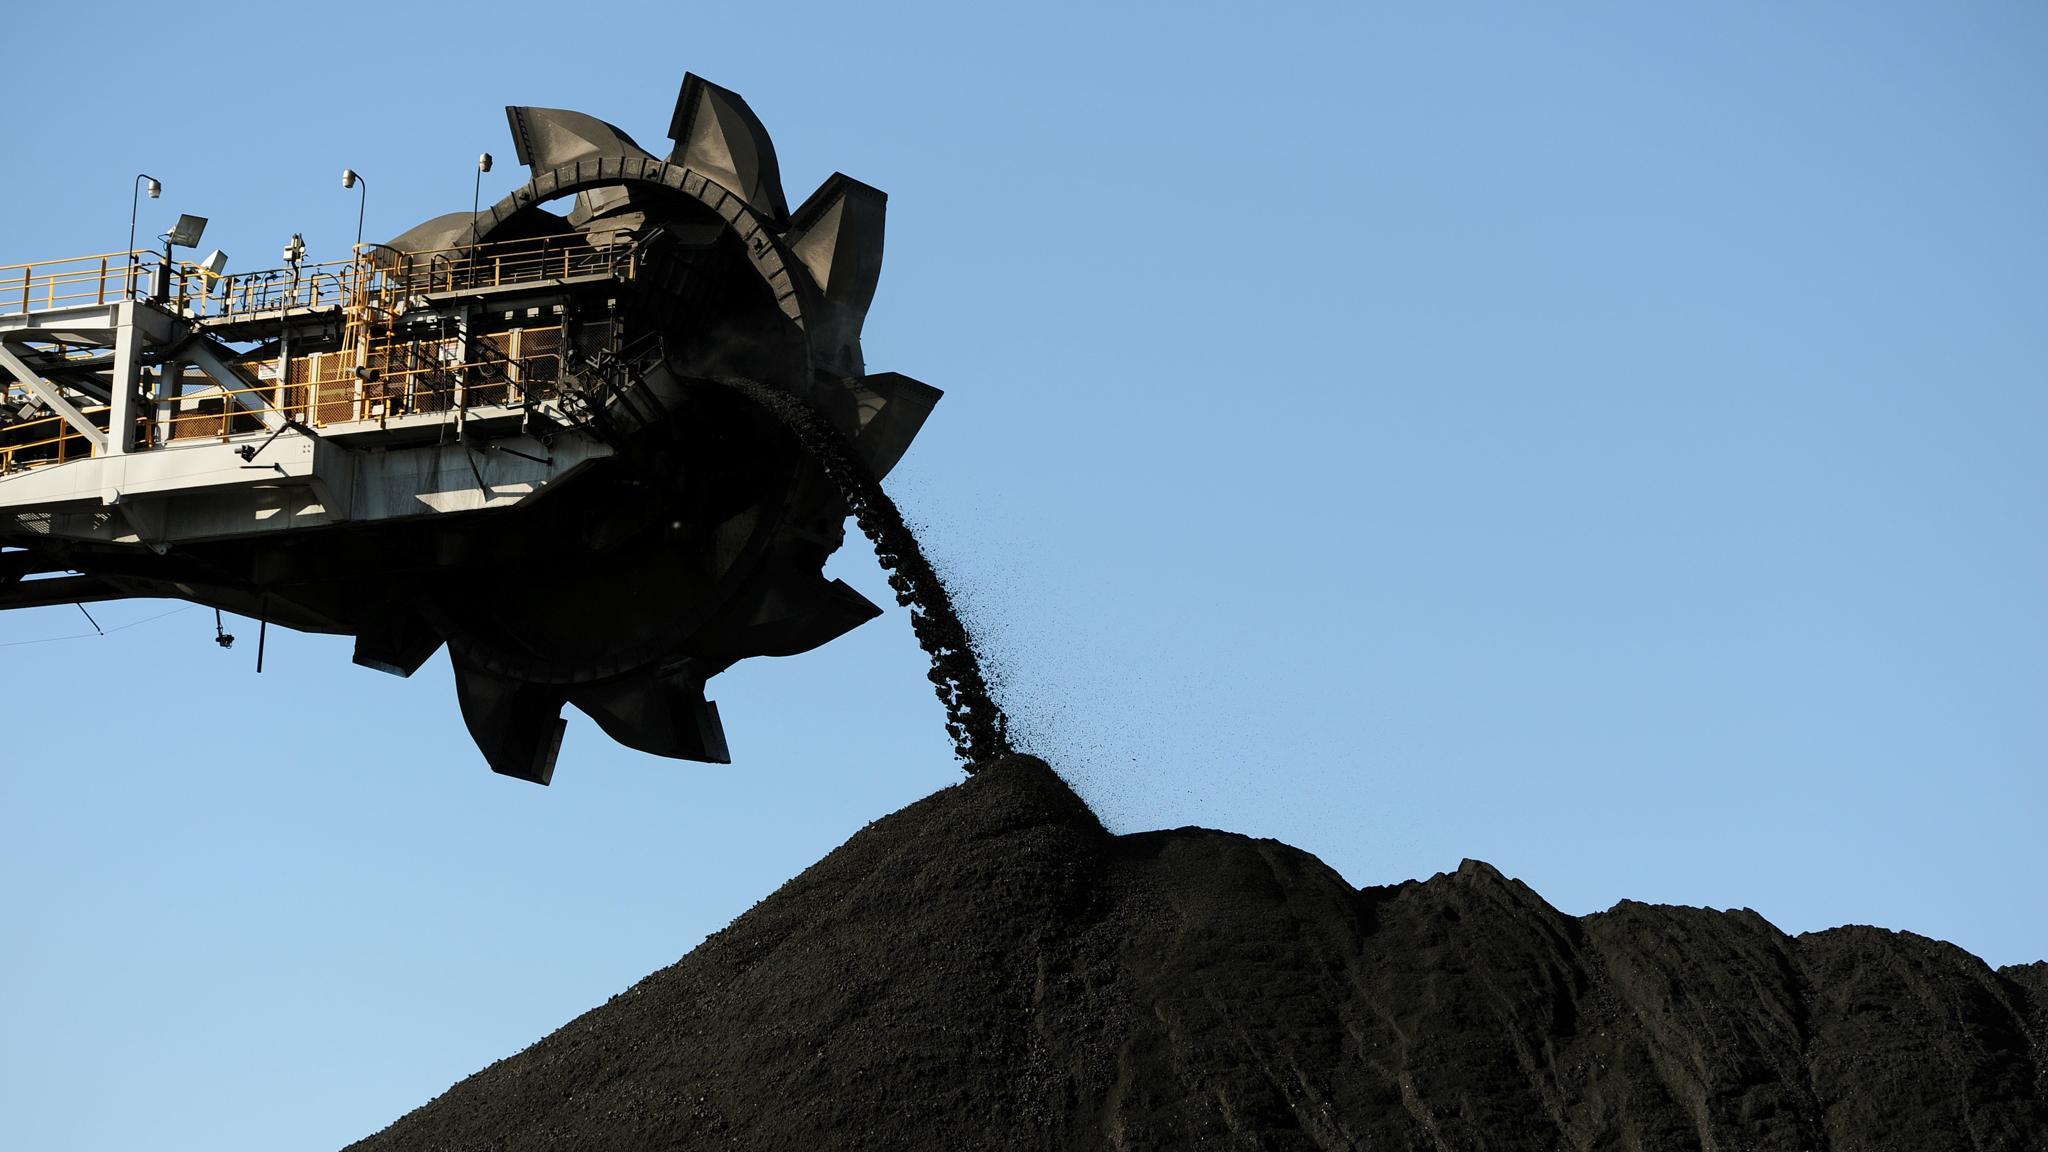 Strong economic case for coal divestment